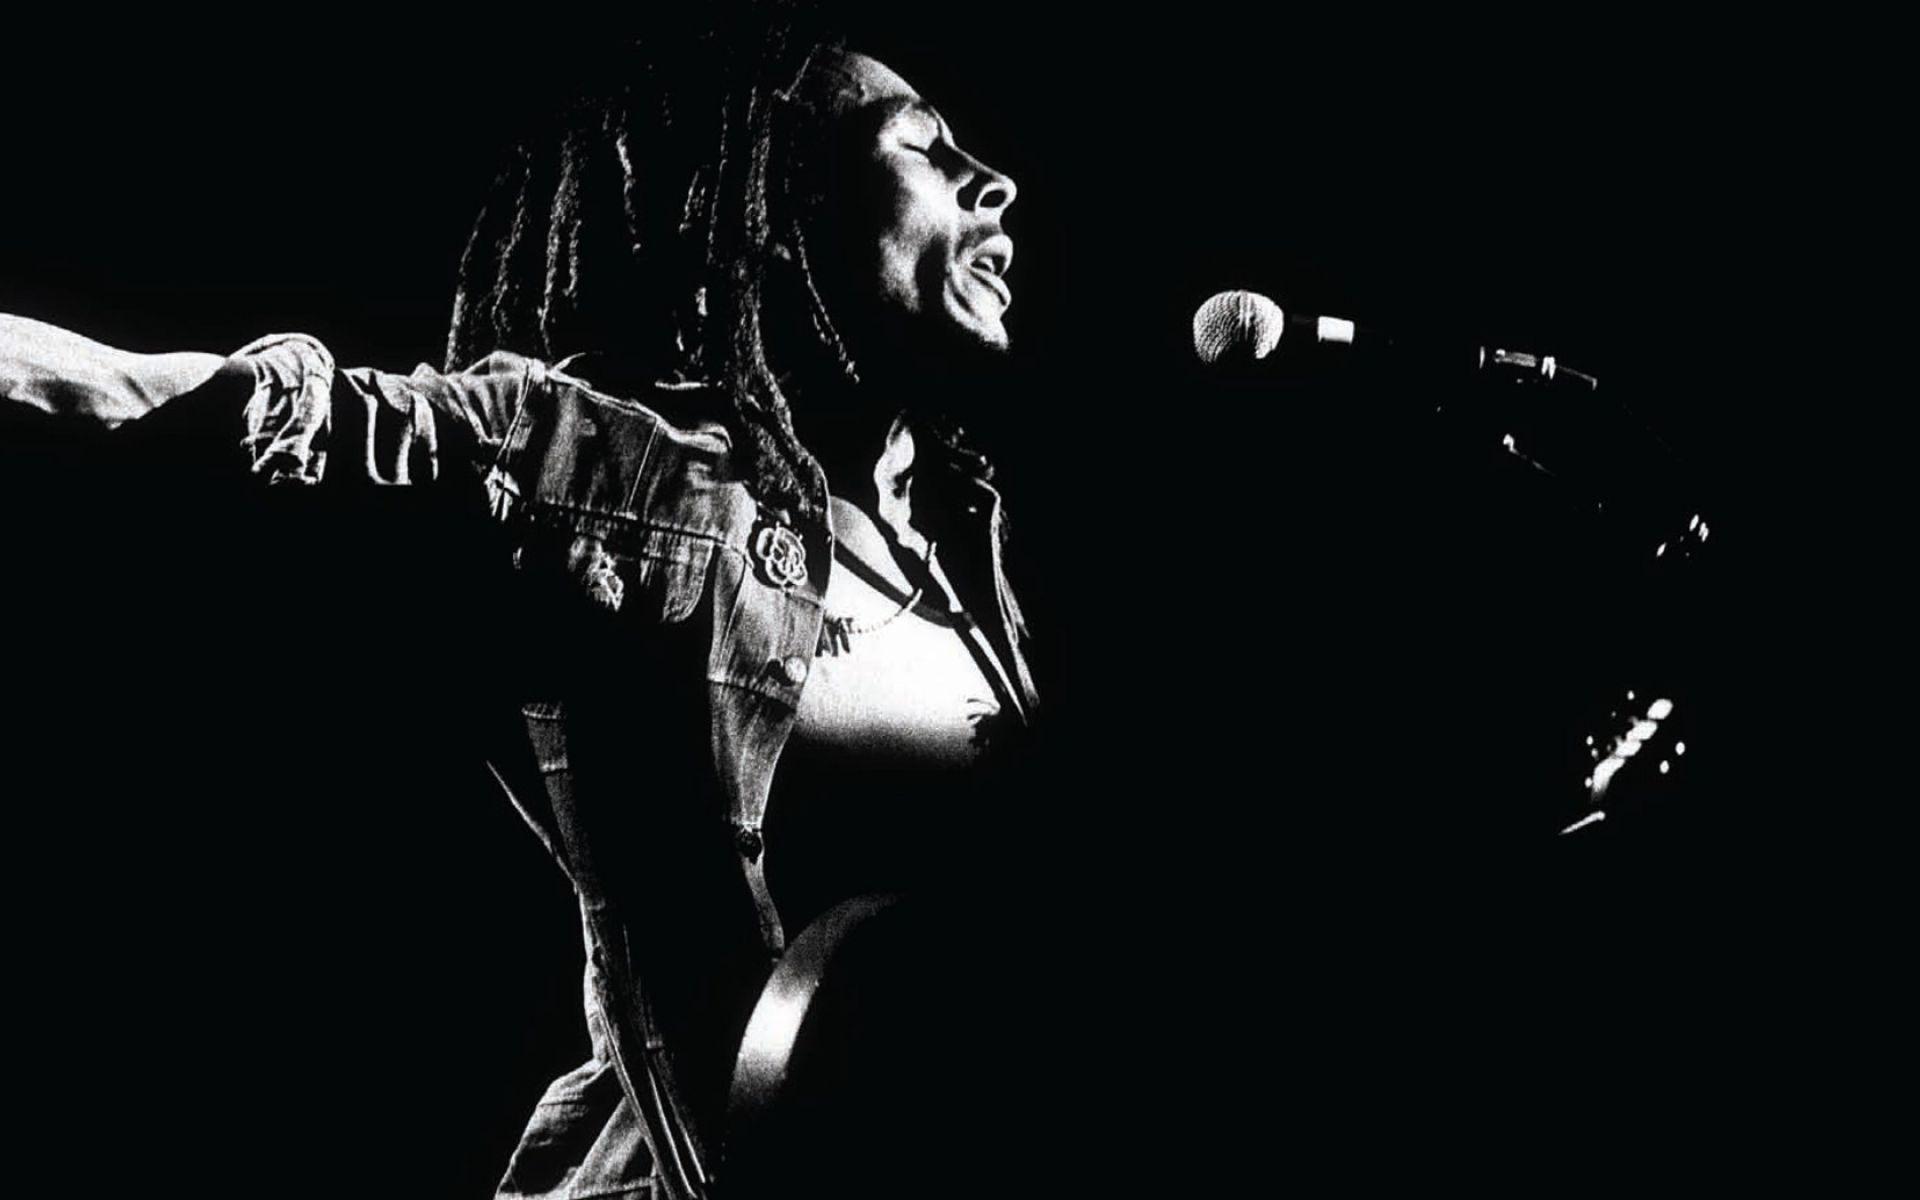 Bob-Marley-Live-Performs-Photo-Black-and-White-HD-xpx-Desktop-Free-wallpaper-wp4405249